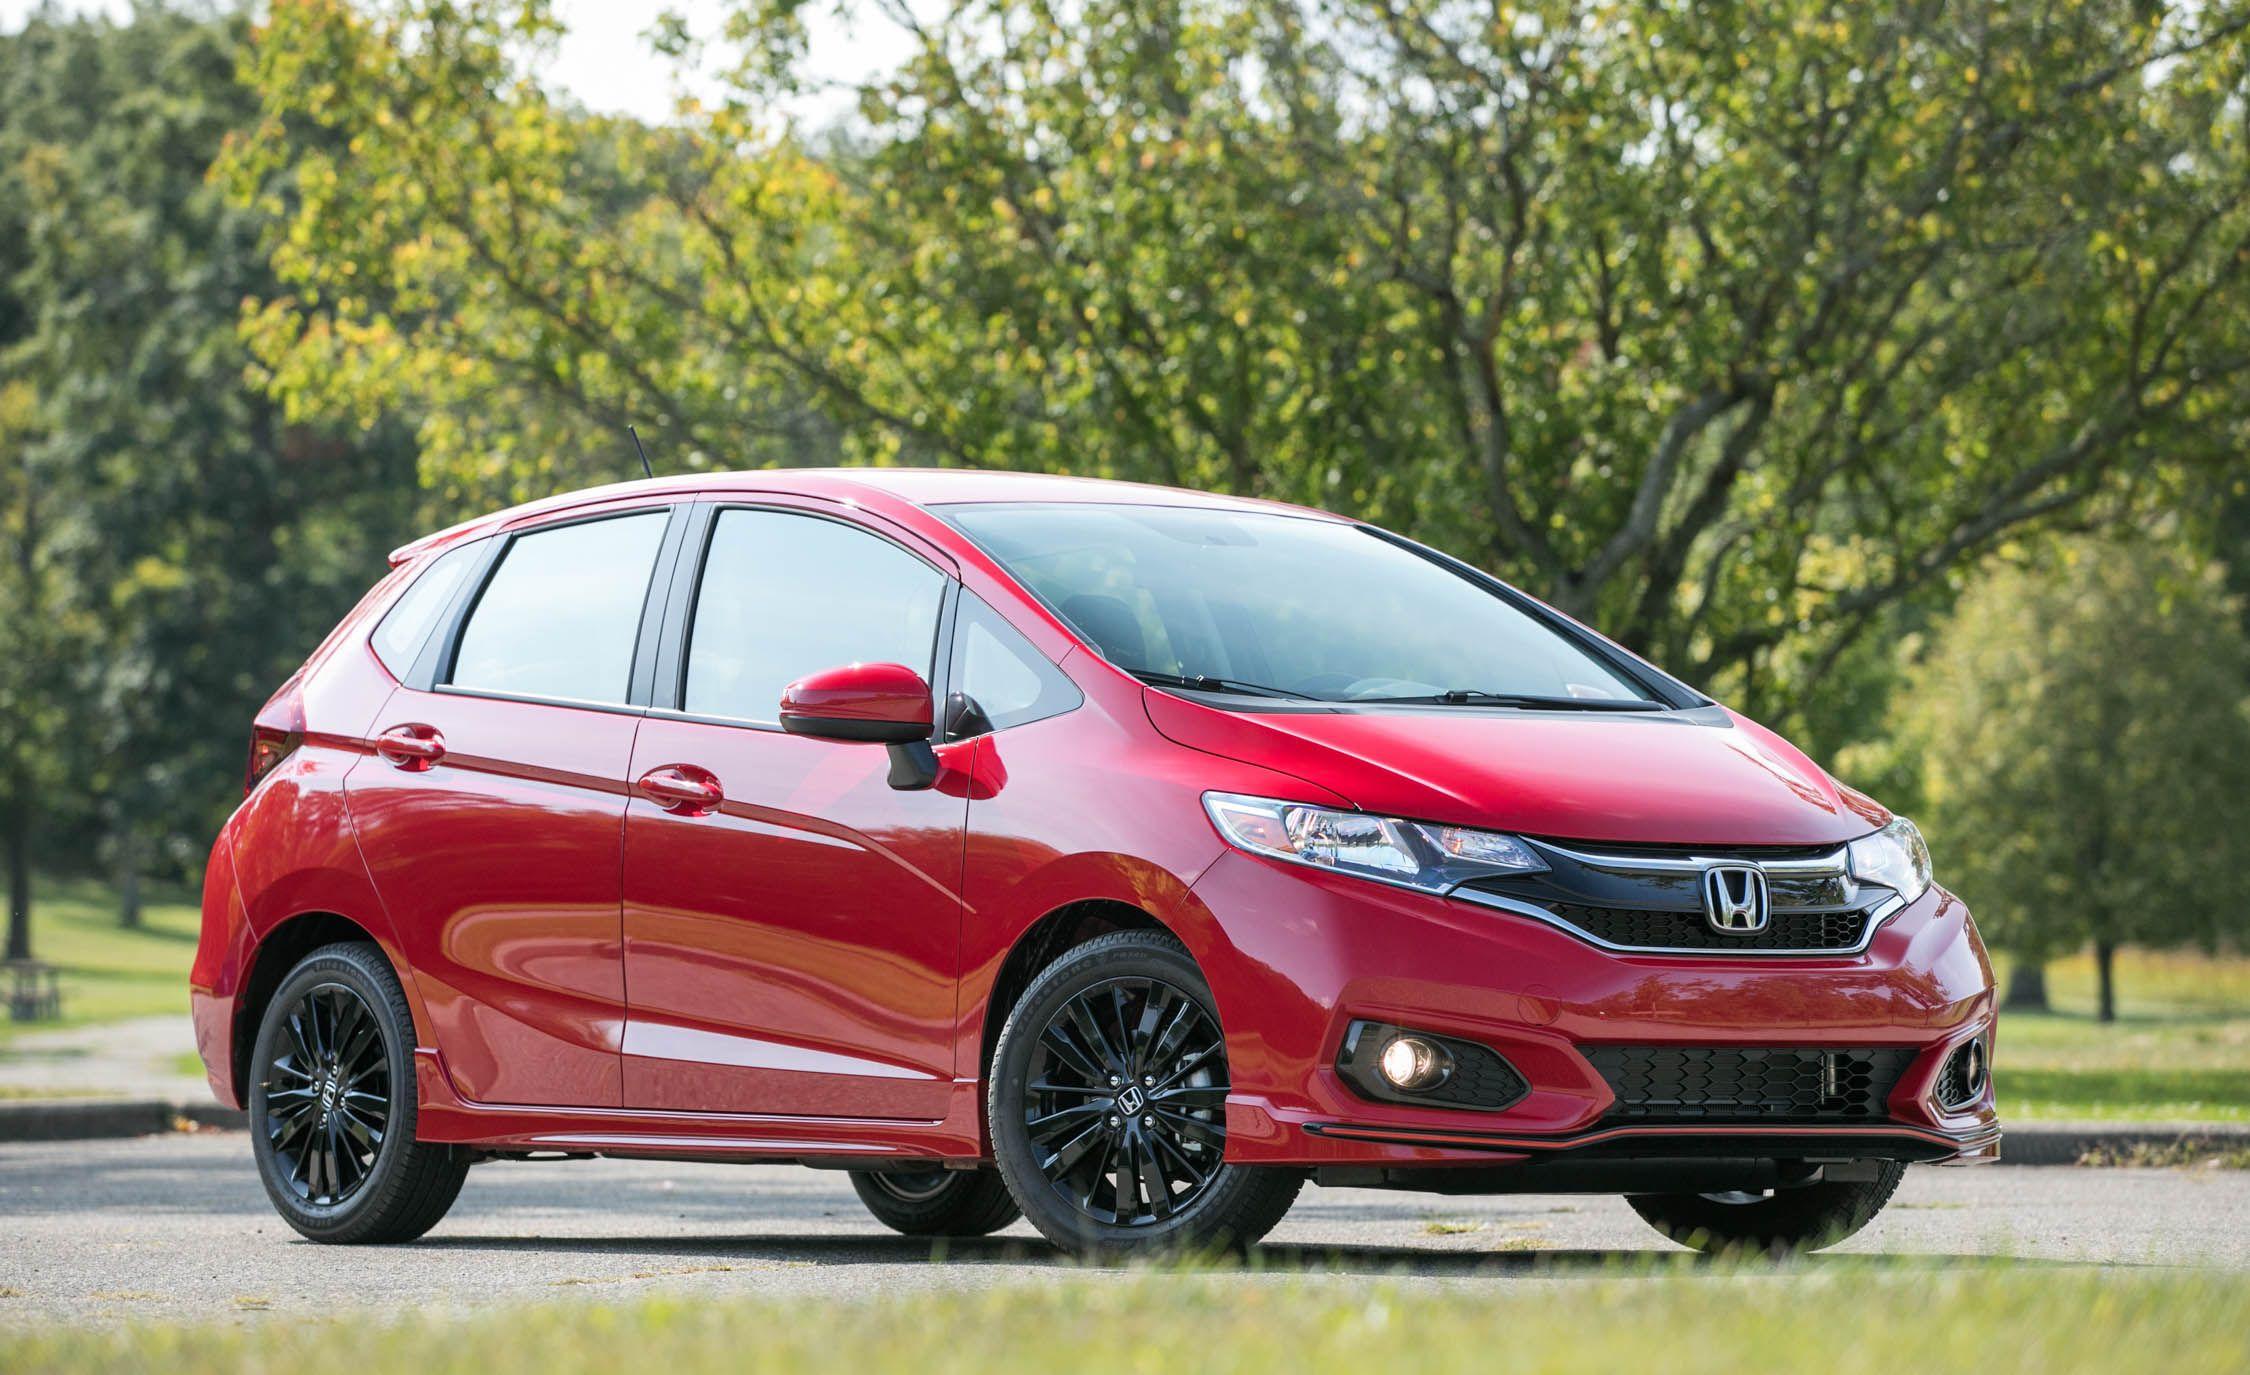 2018 Honda Fit Fuel Economy Review